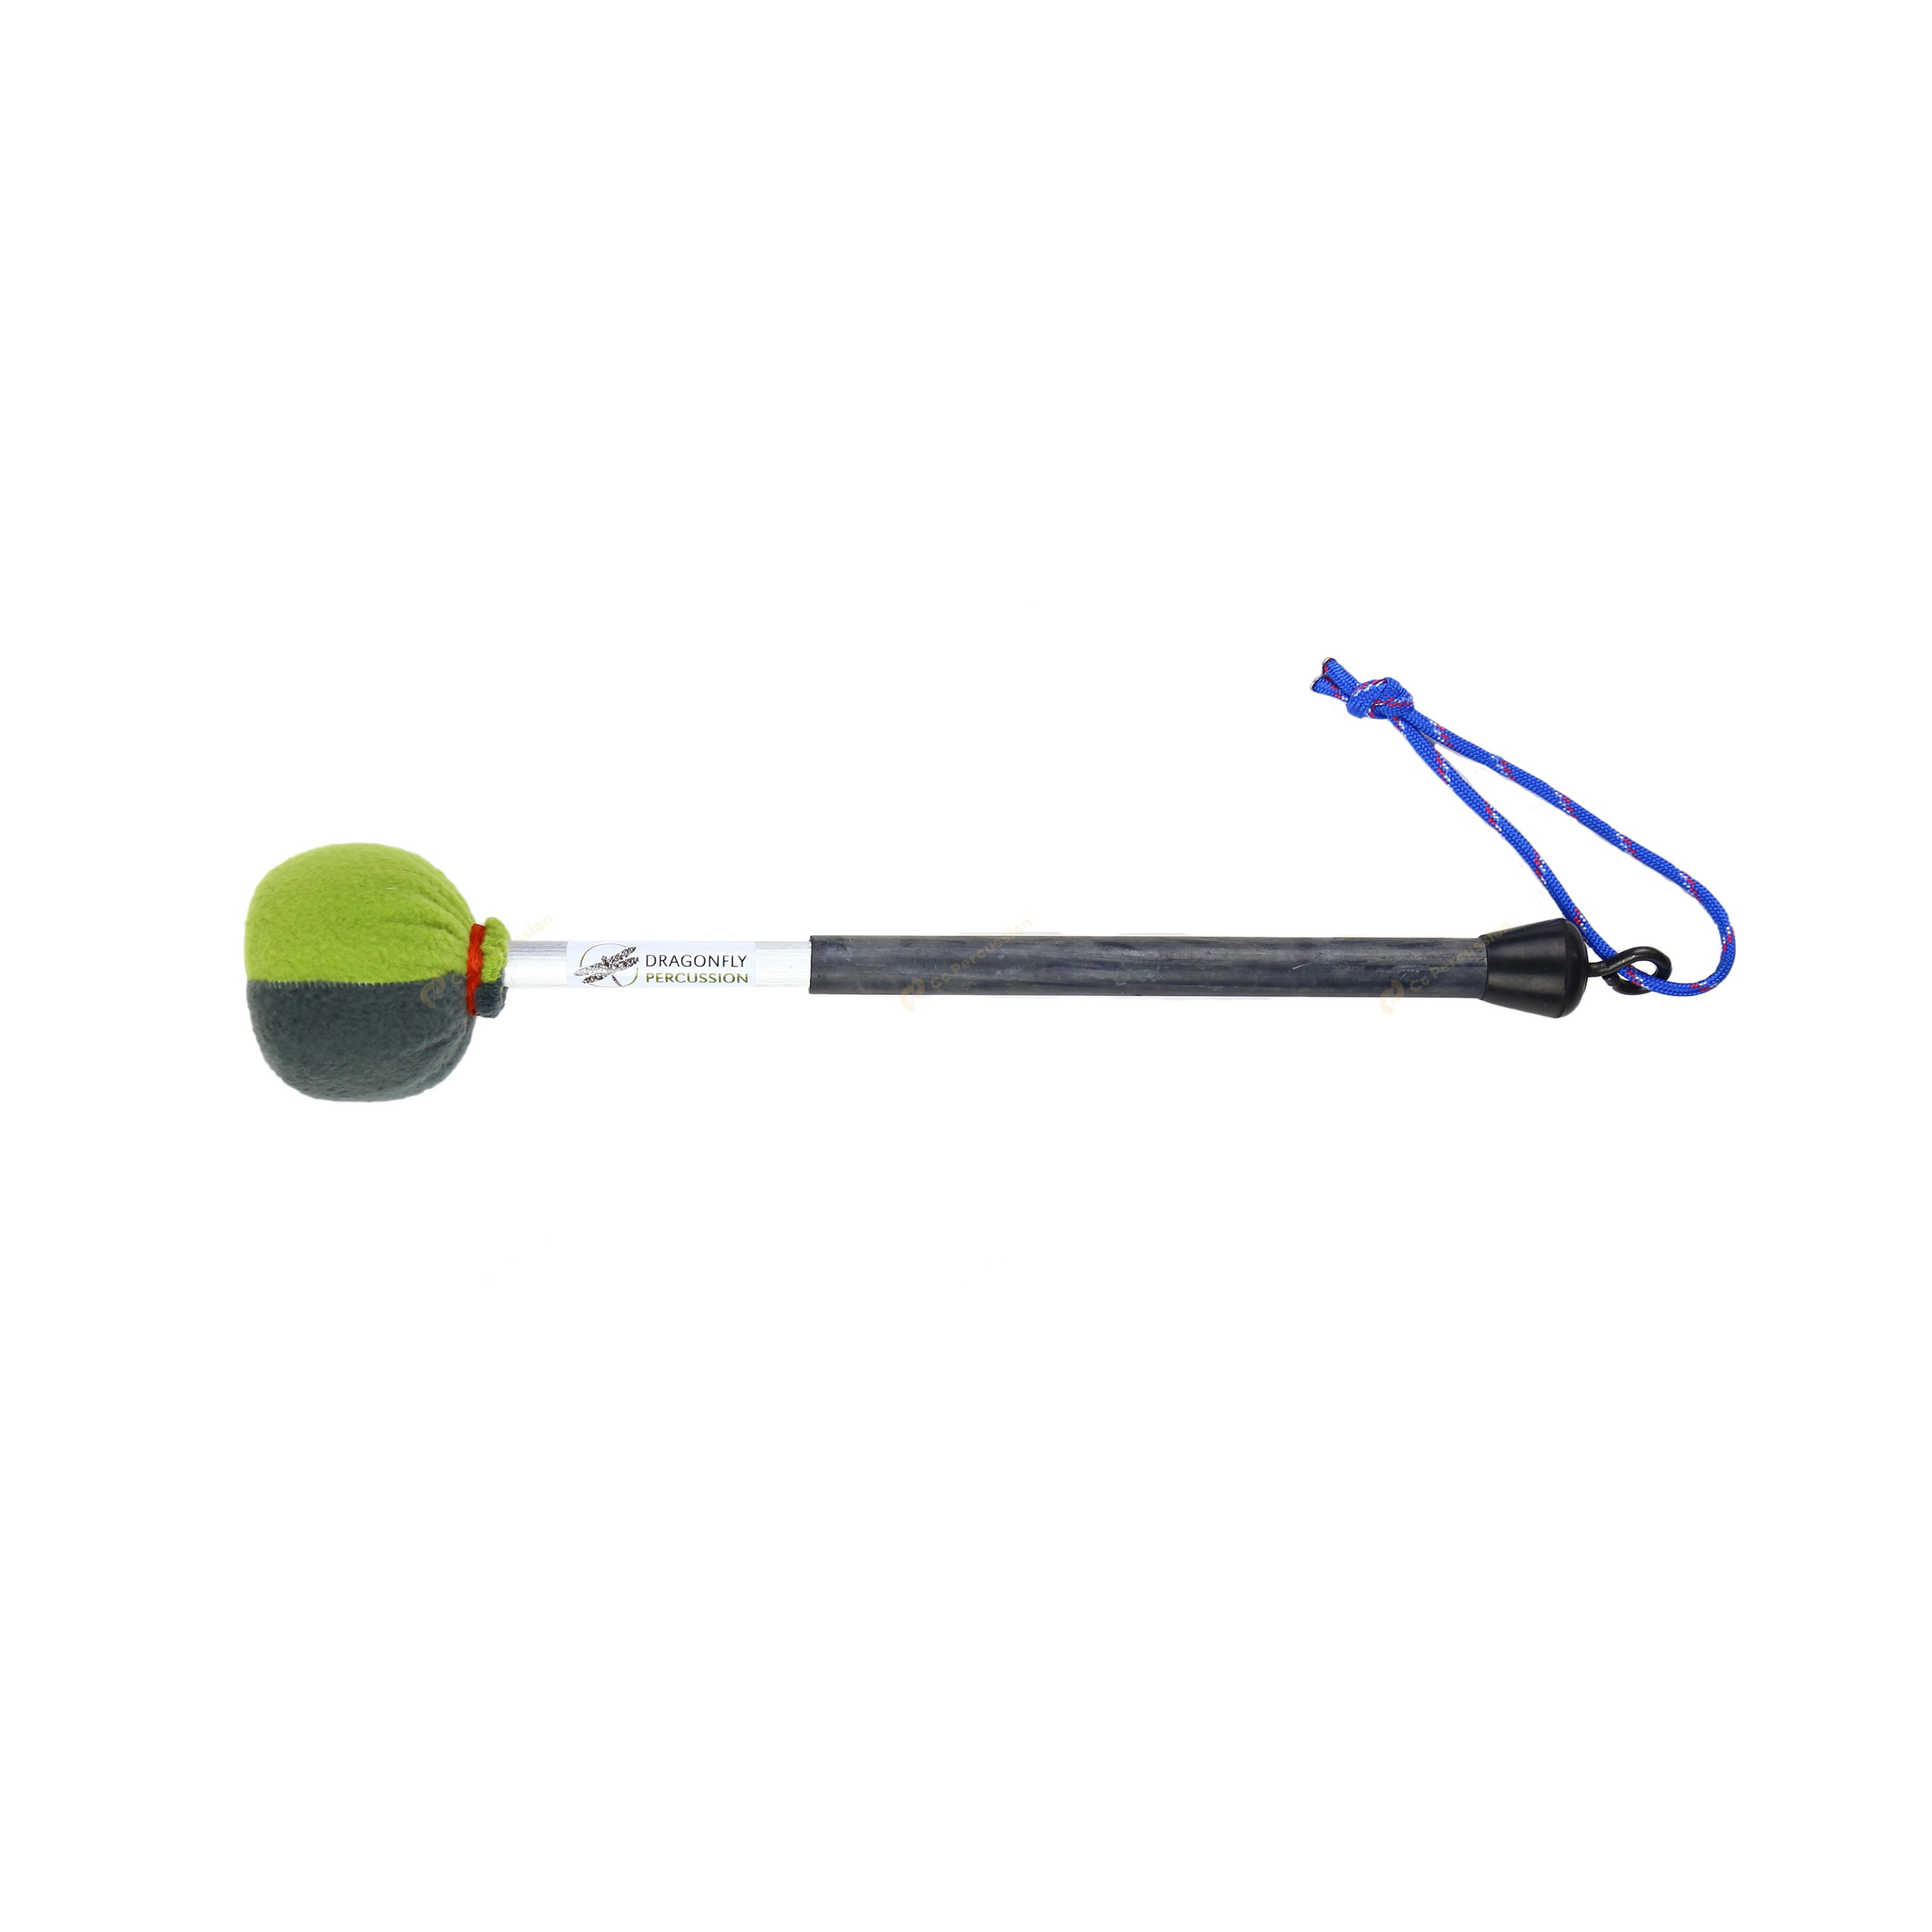 Dragonfly SCT 手工 鋼鐵核心 雙面 平面鑼(Tam)槌